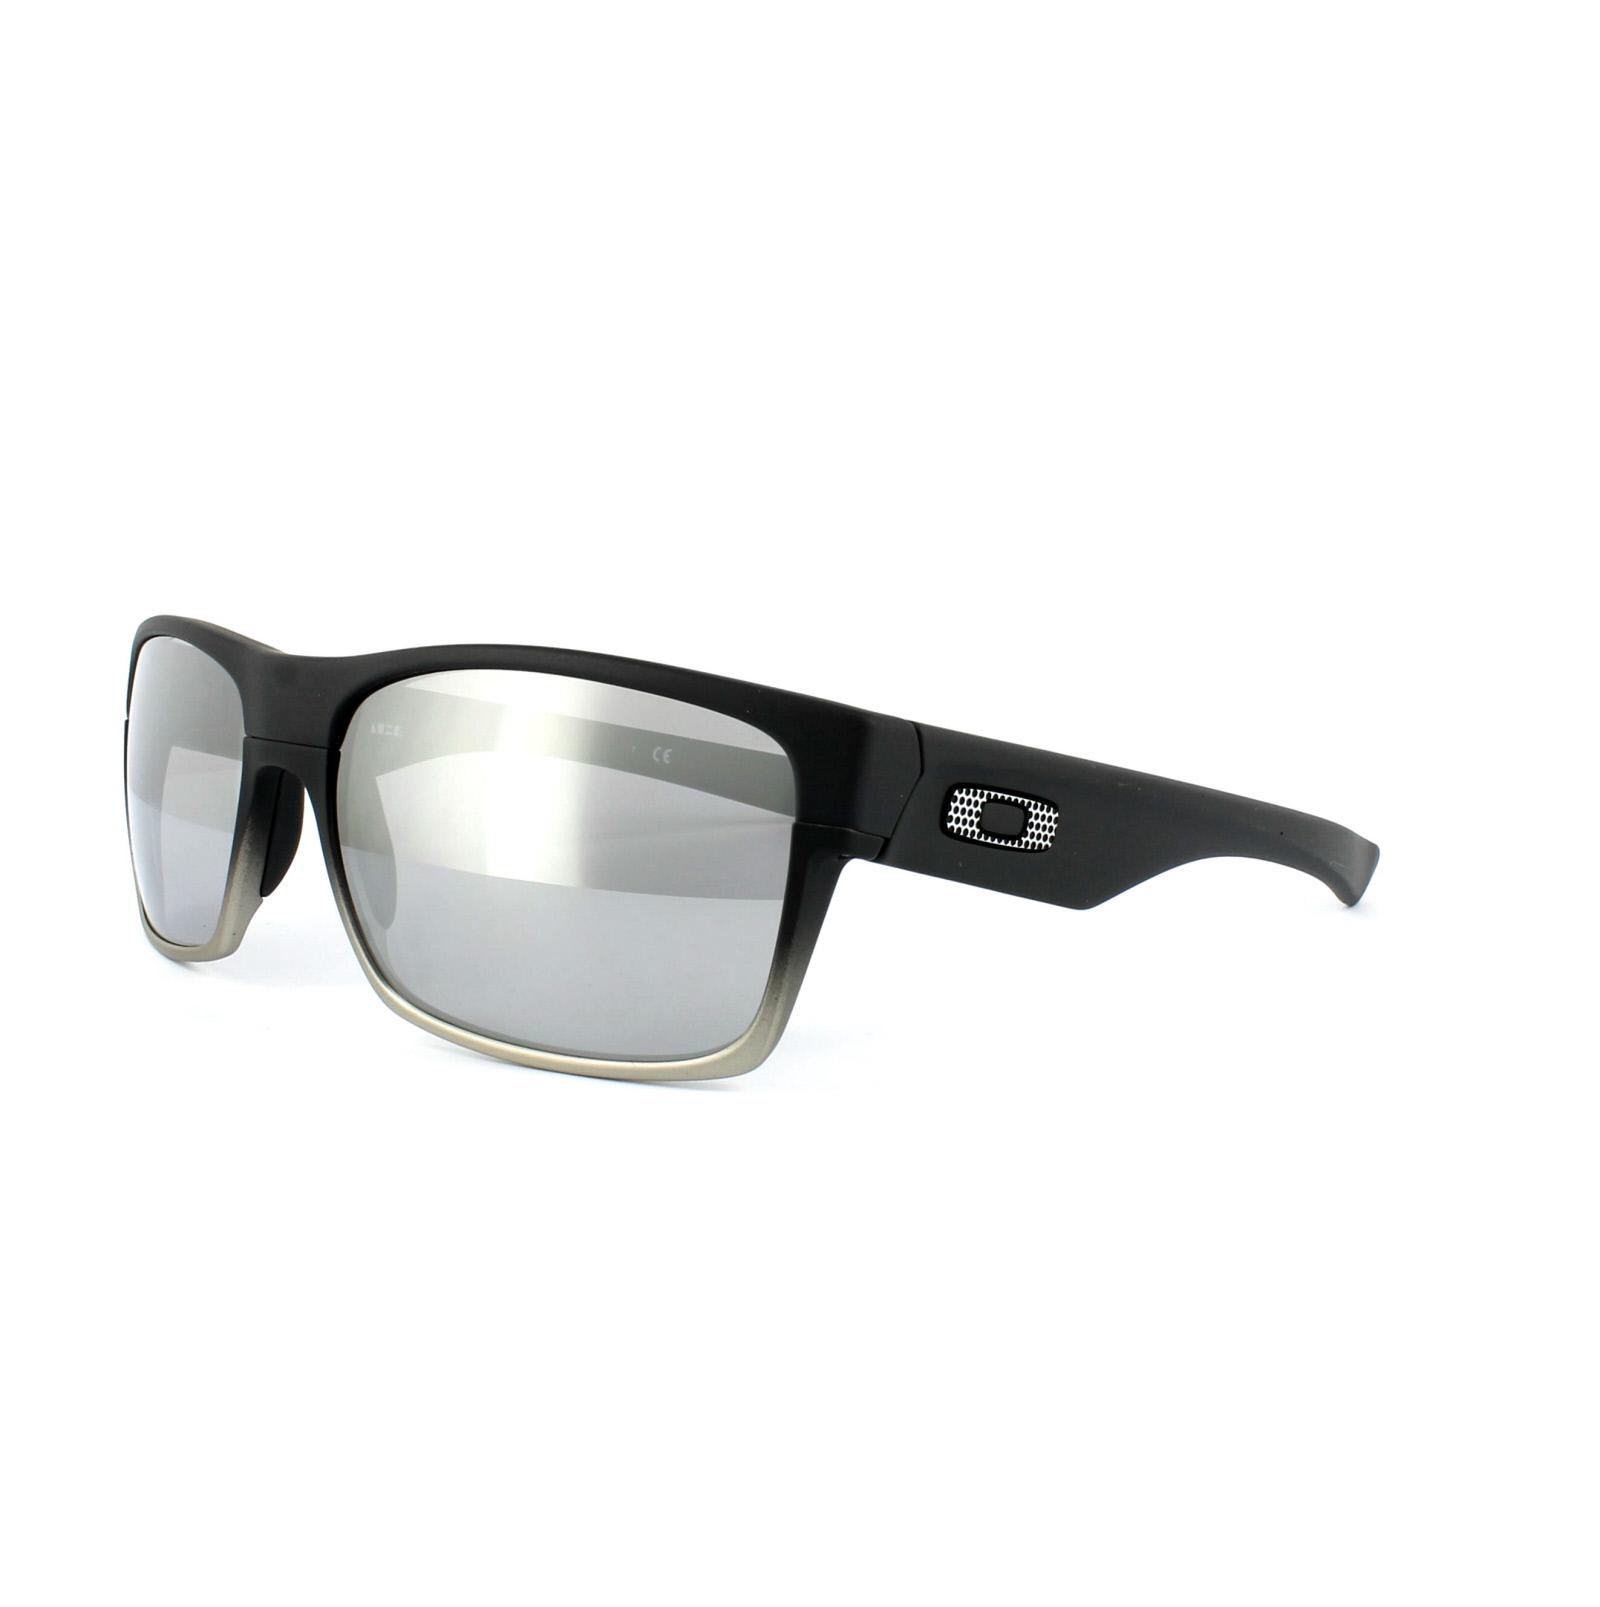 Glasses Frame Repair Liverpool : oakley sunglasses twoface